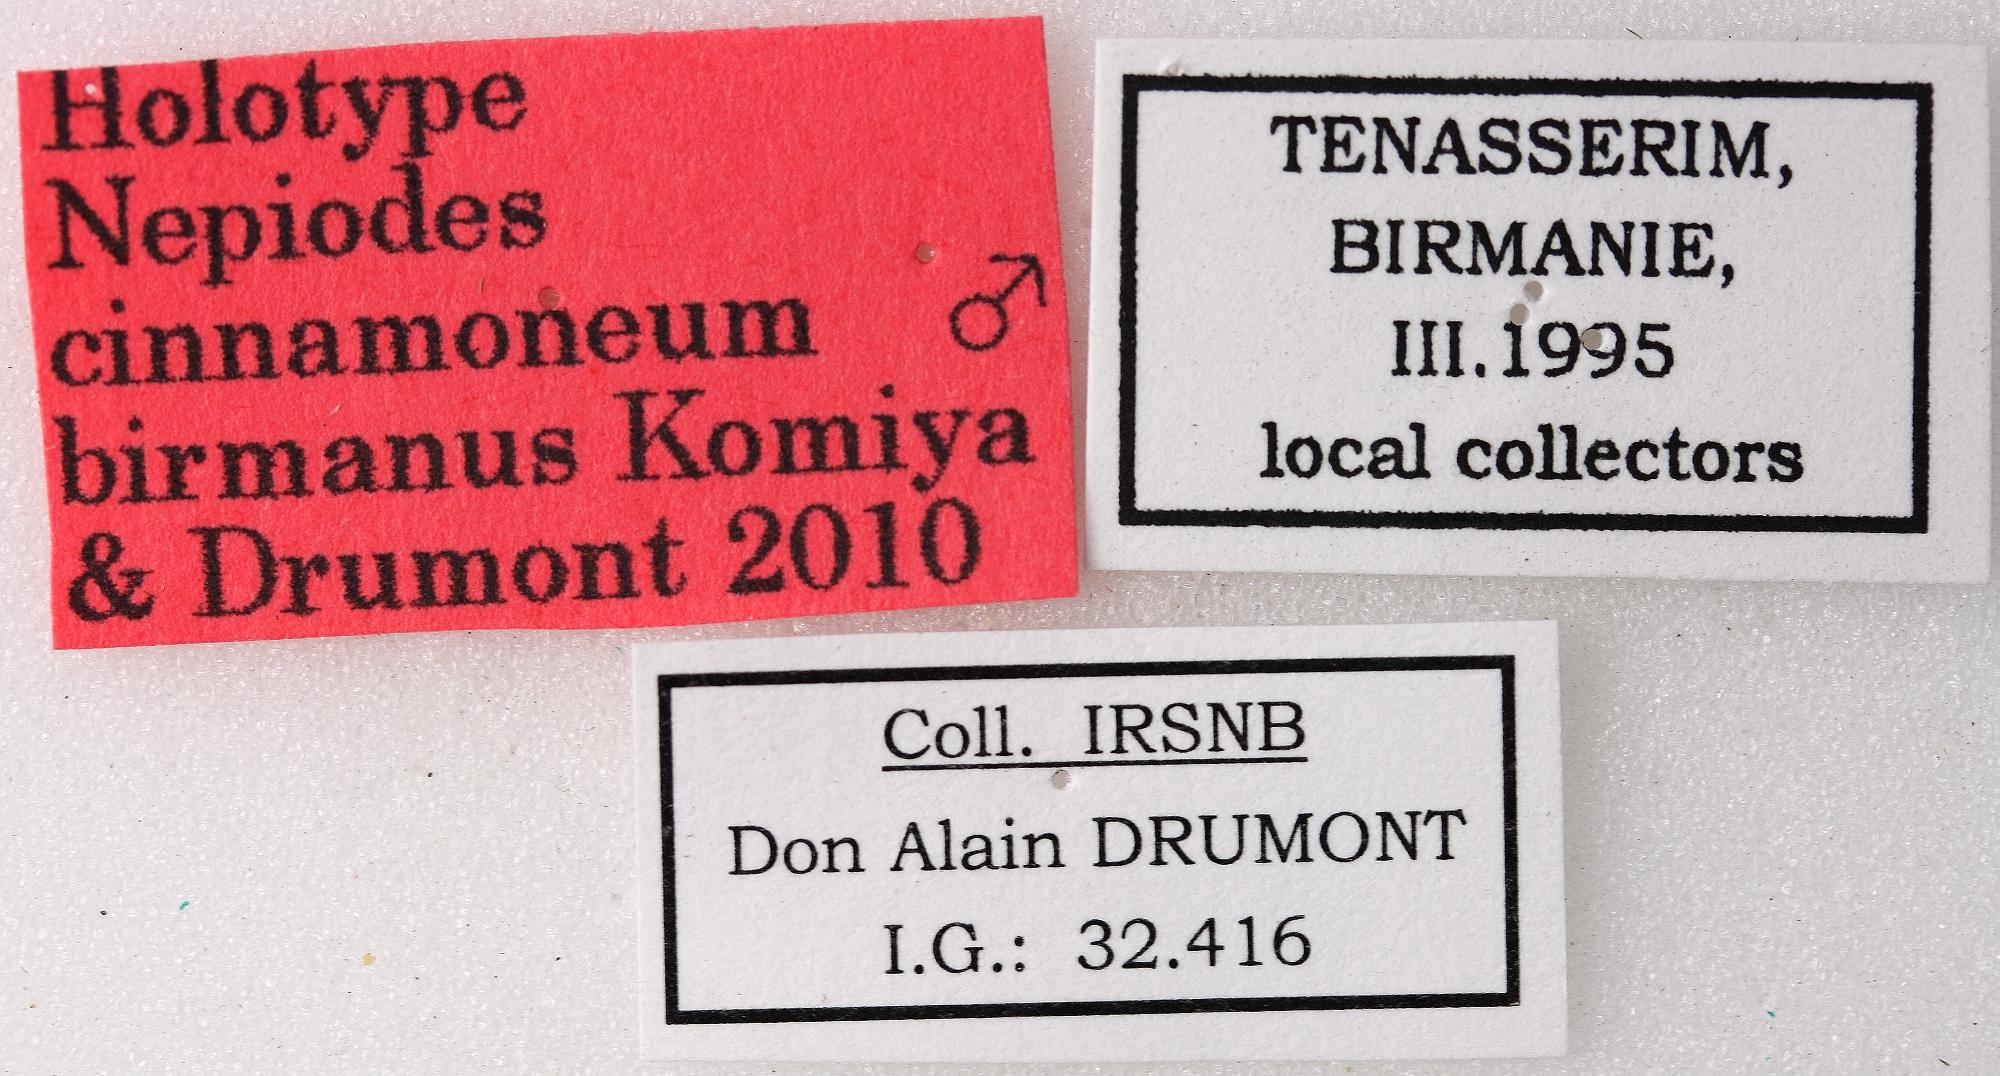 Nepiodes cinnamoneum birmanus 01 00 Holotype M 029 BRUS 201405.jpg